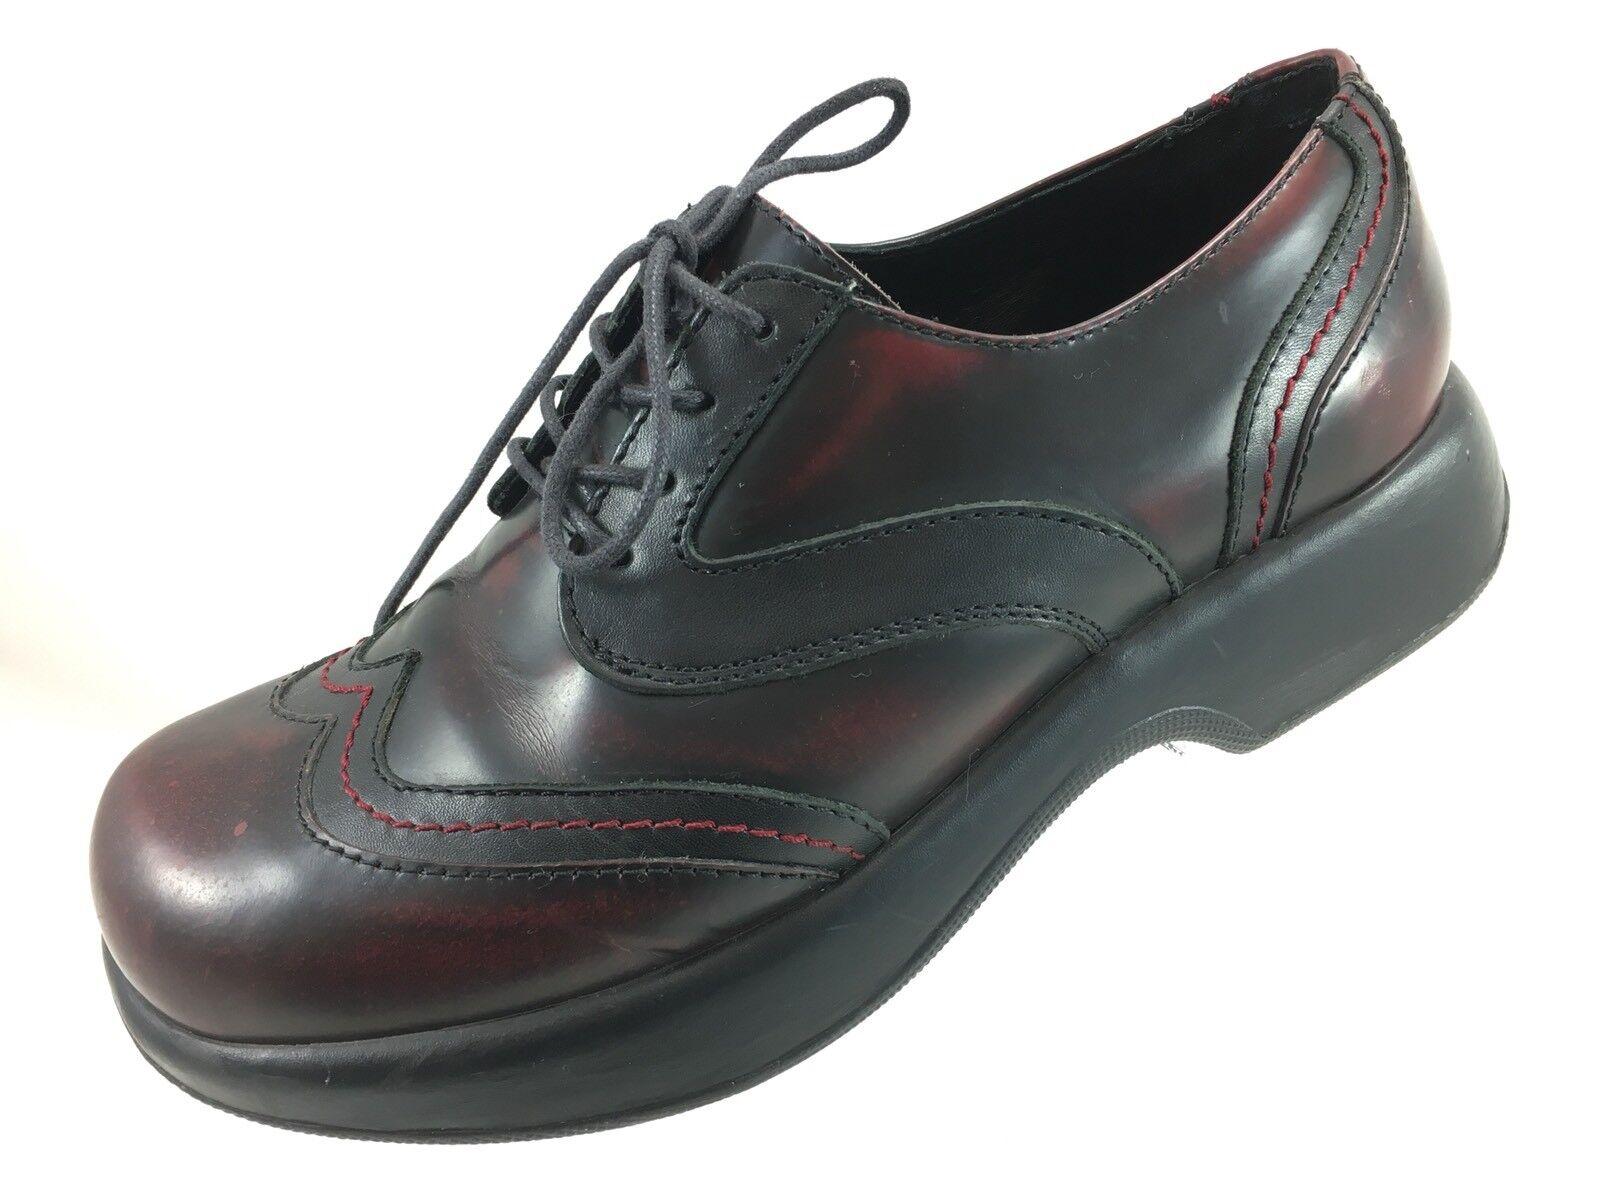 SH24 Dansko US 9.5-10 Brown Oxblood Leather Oxford Wingtip shoes